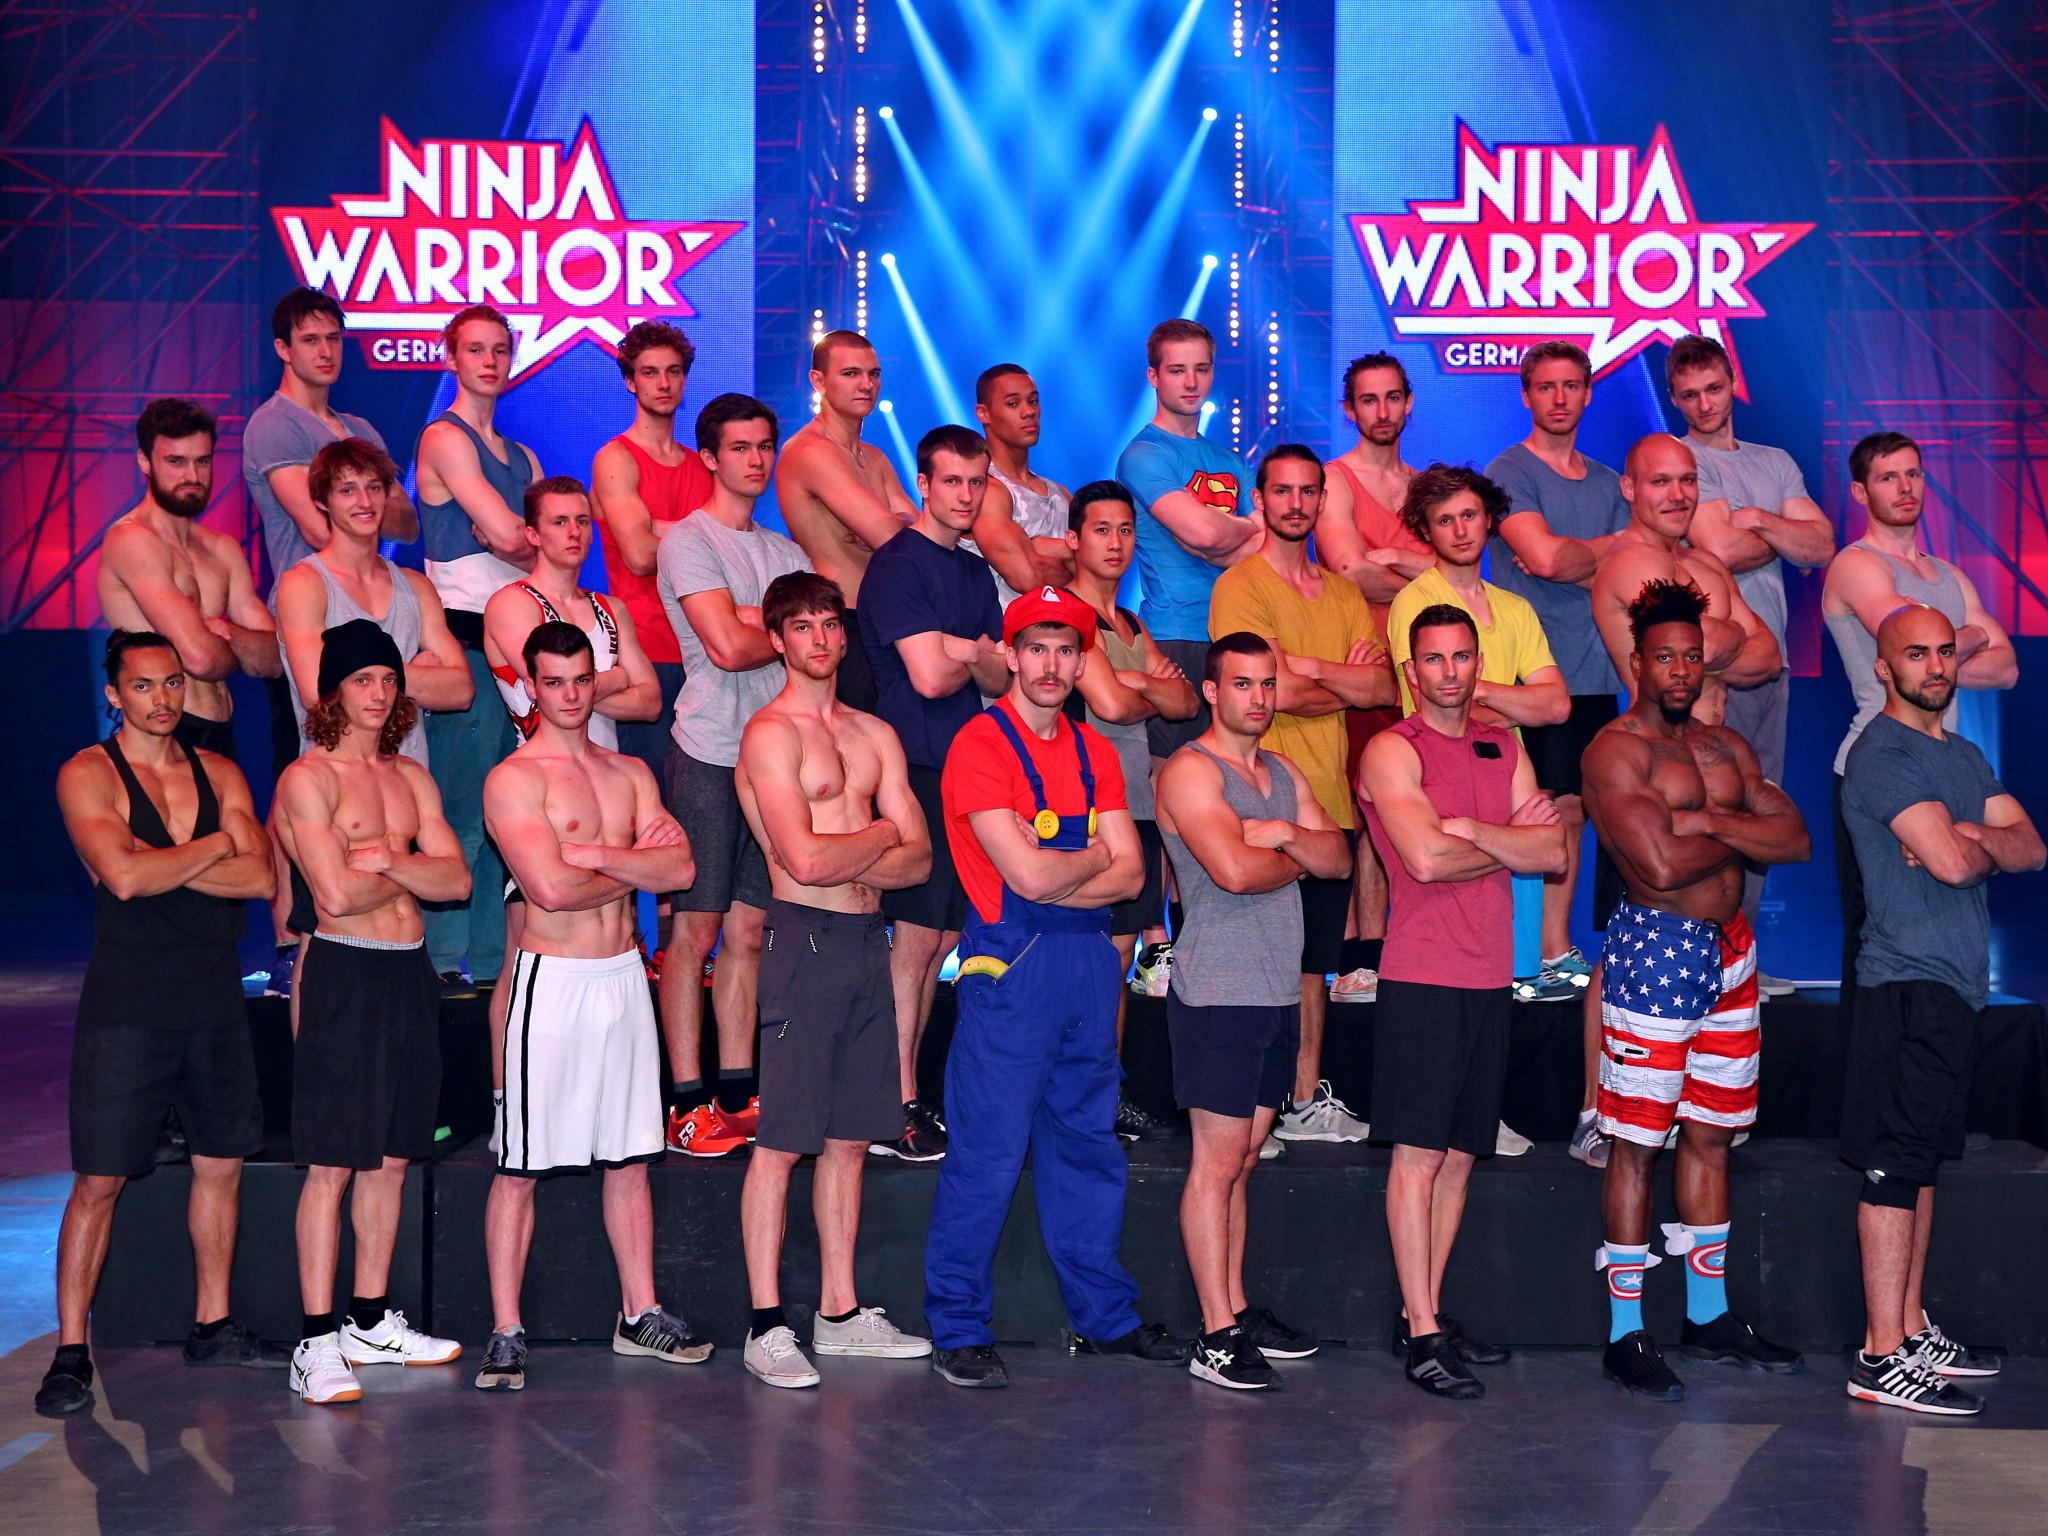 ninja warrior germany 2017